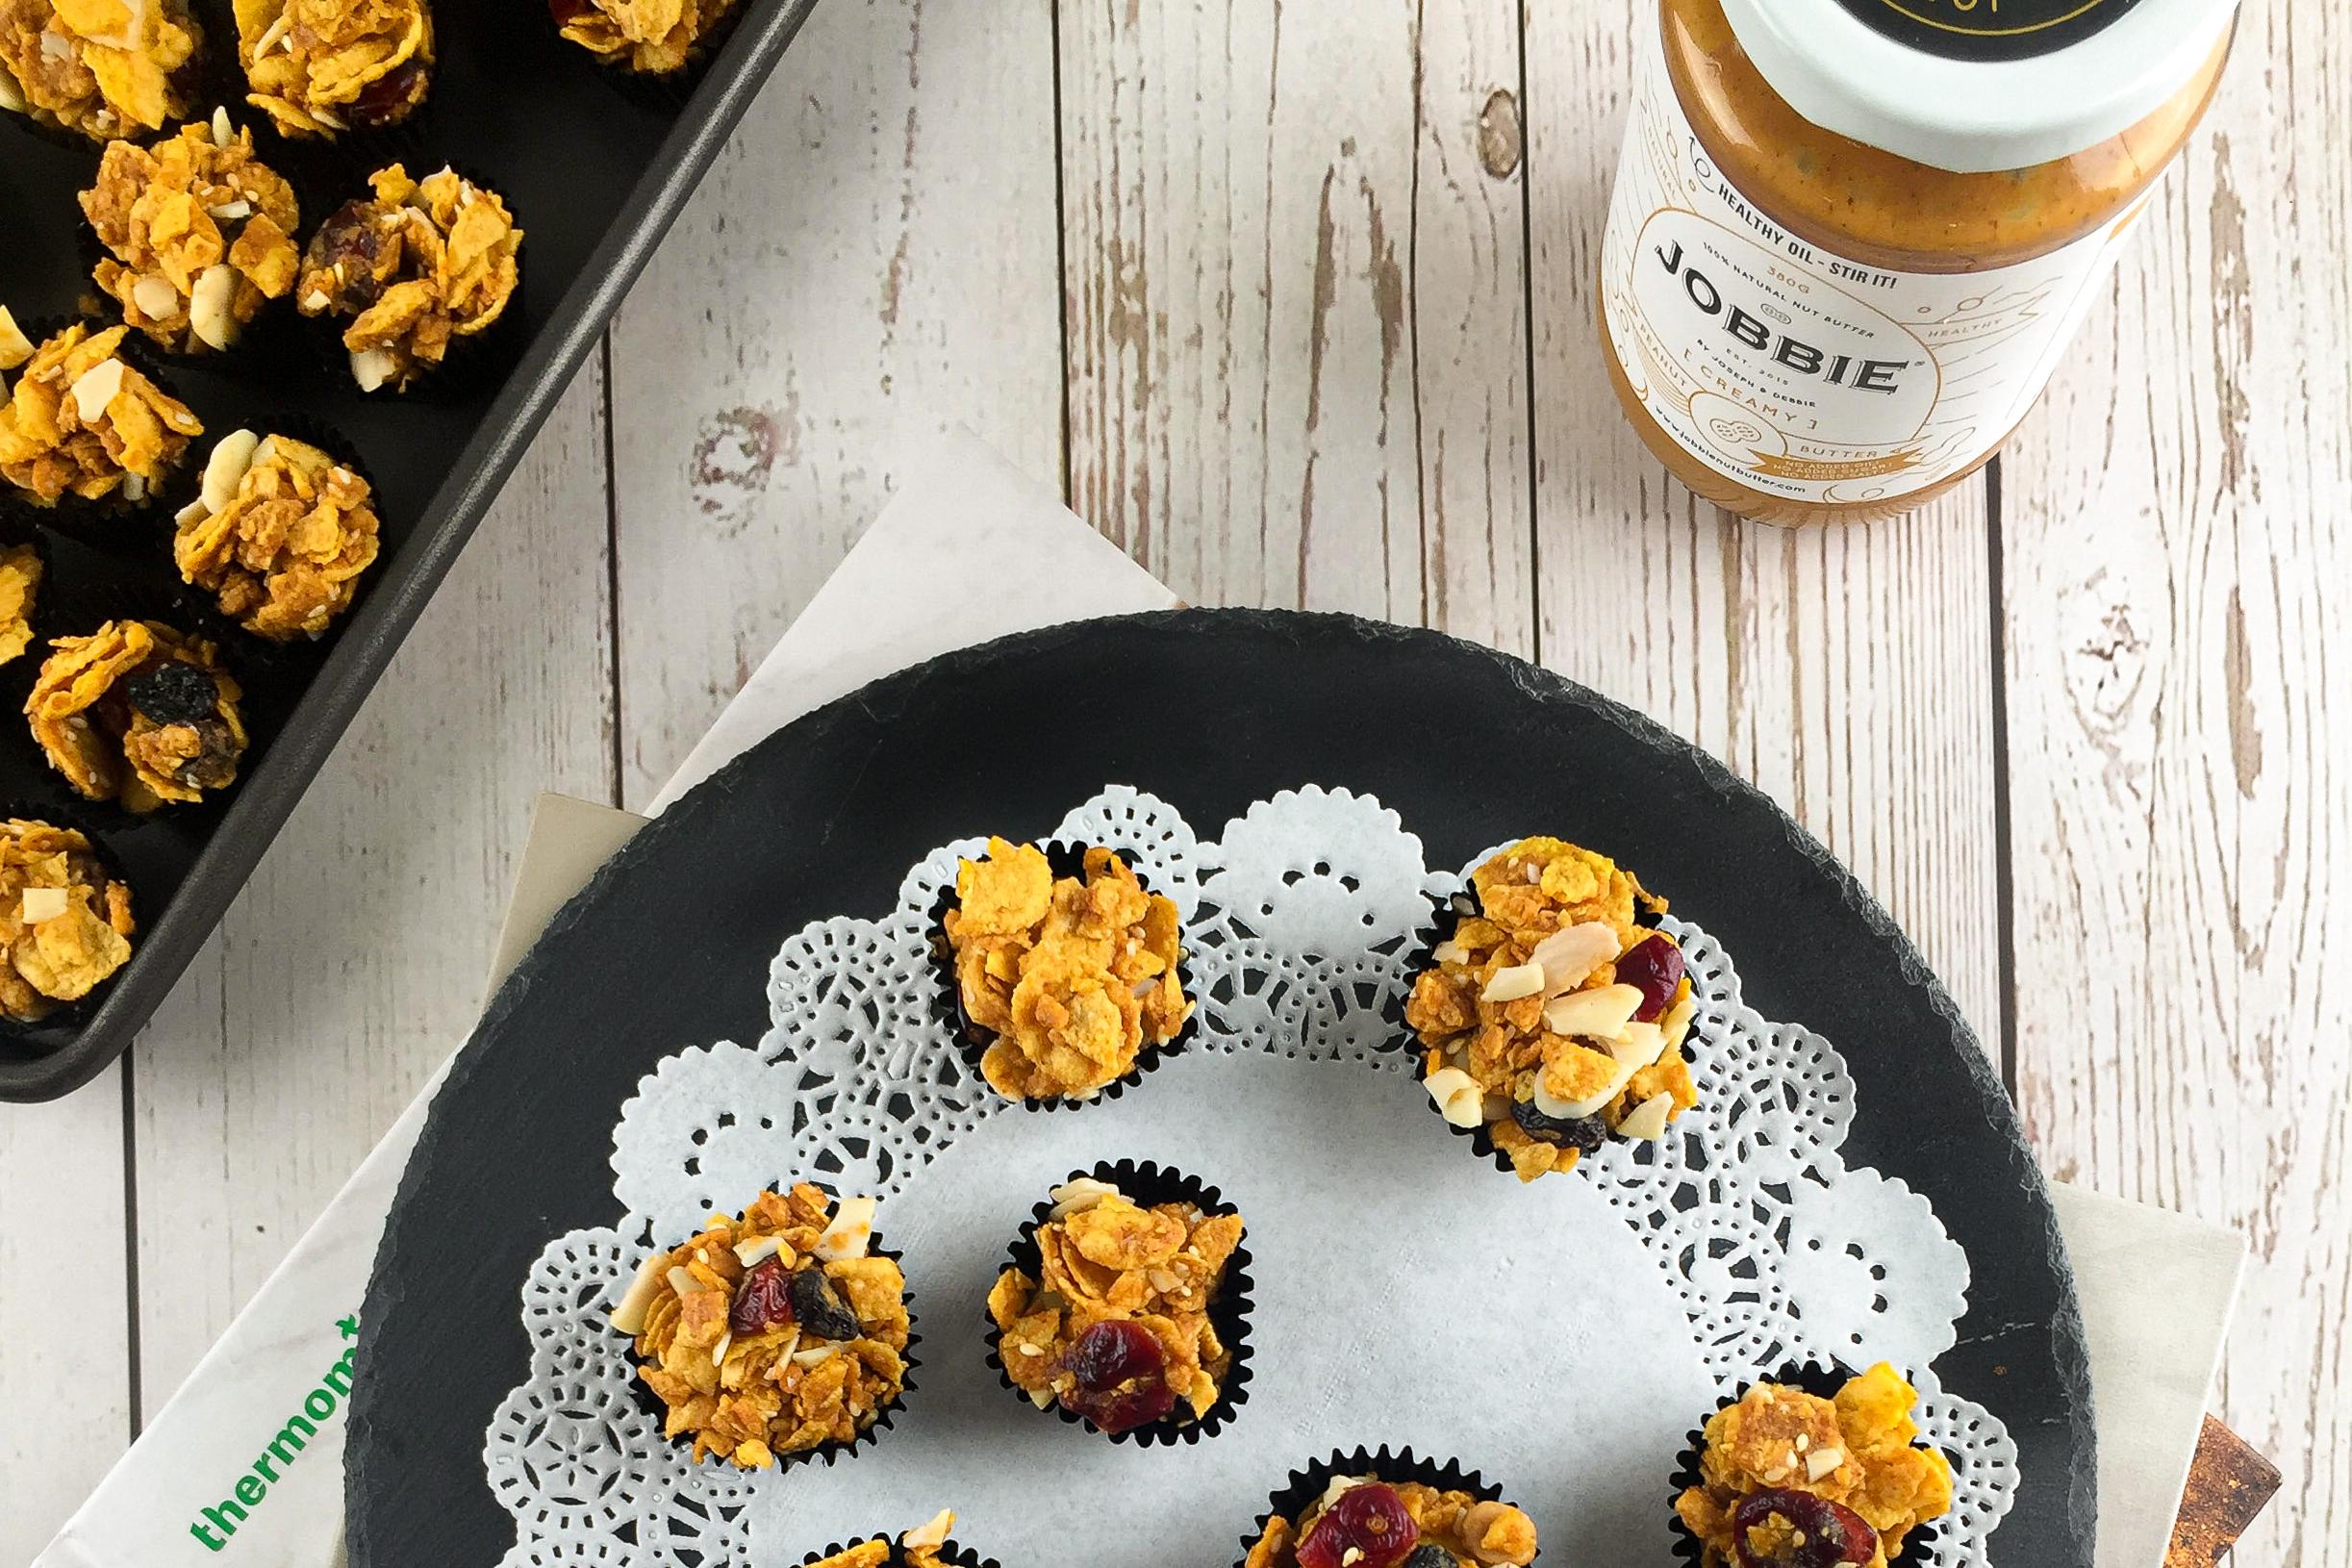 JOBBIE Peanut Butter Cornflakes Cookies